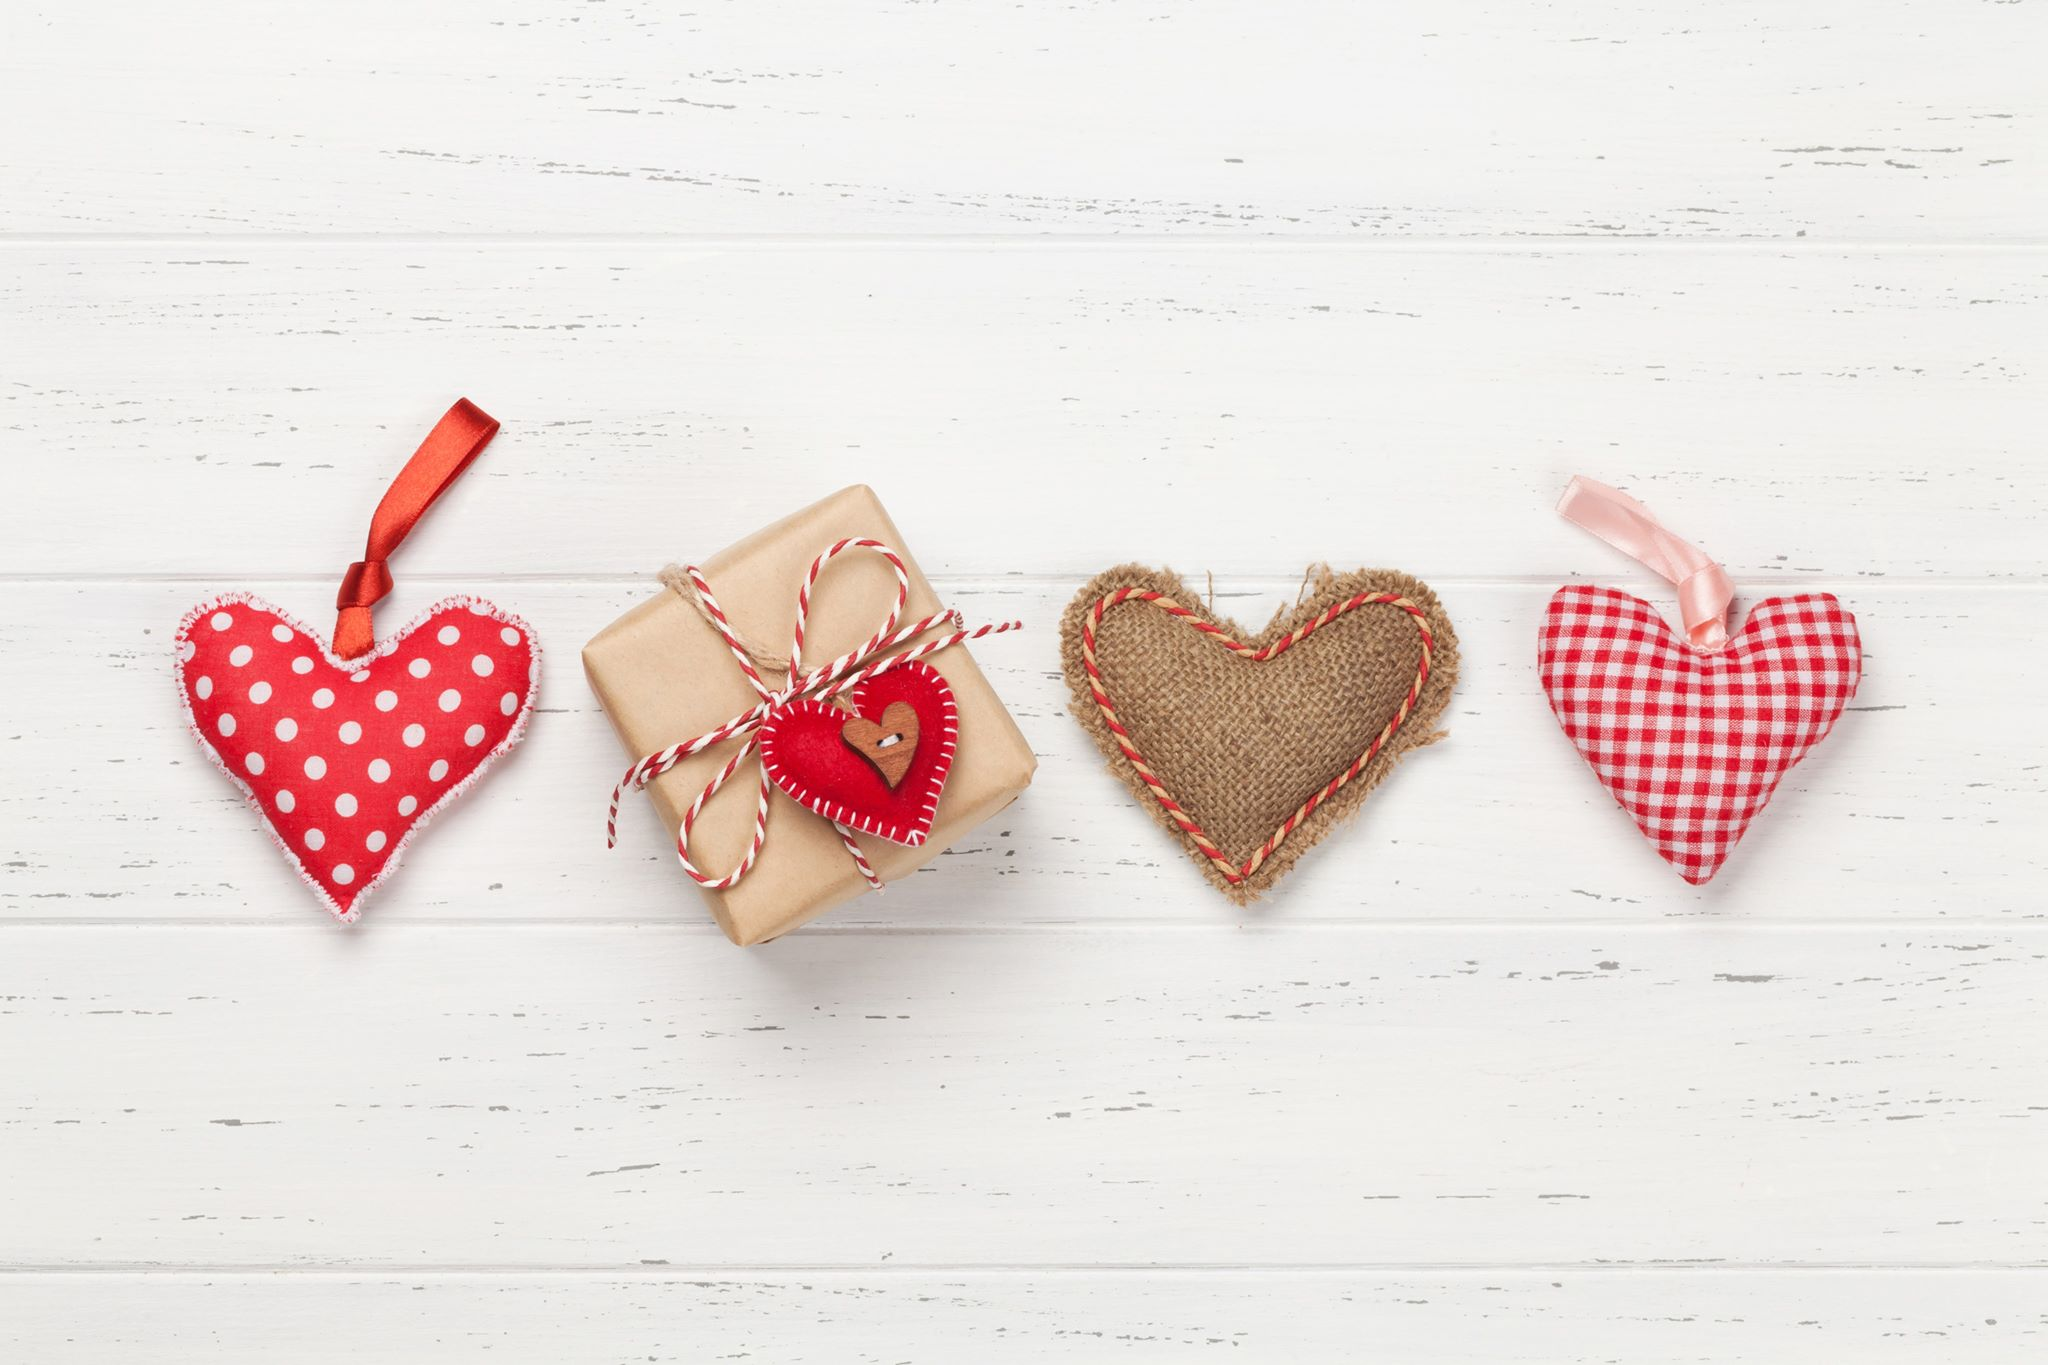 Valentines day images 25 صور عيد الحب